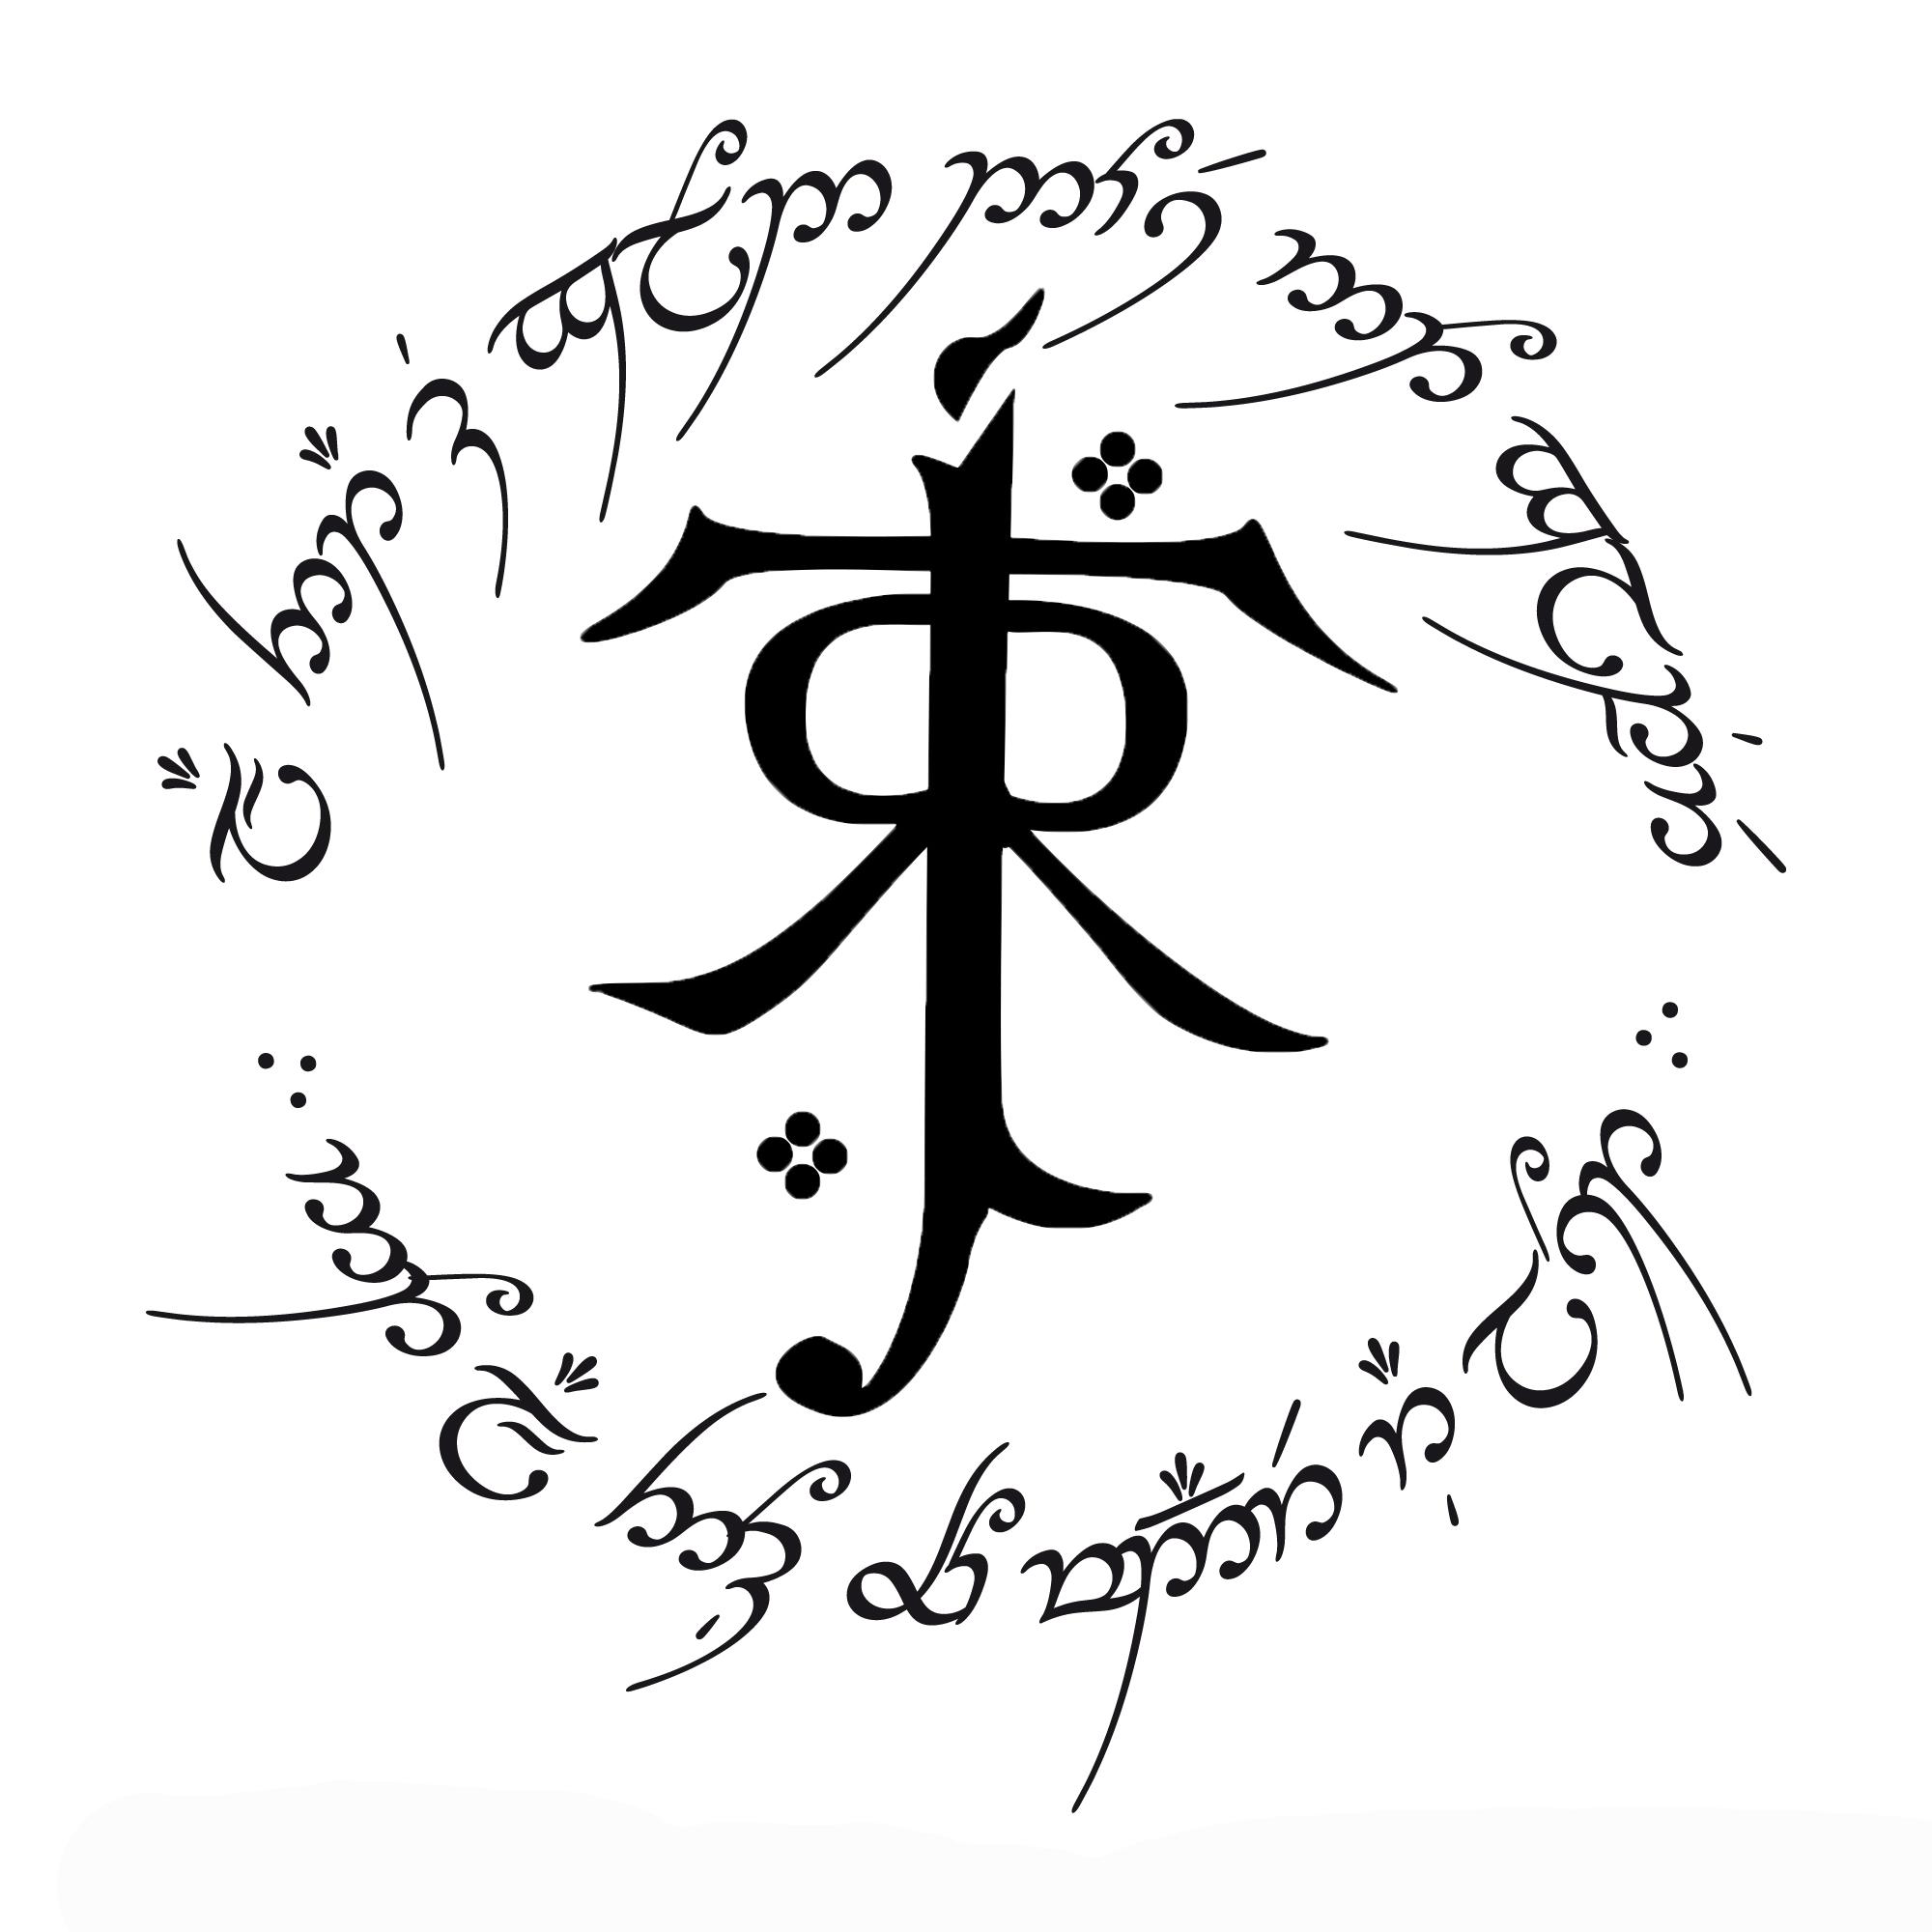 Tolkien tattoo by hurina on deviantart tolkien tattoo by hurina tolkien tattoo by hurina buycottarizona